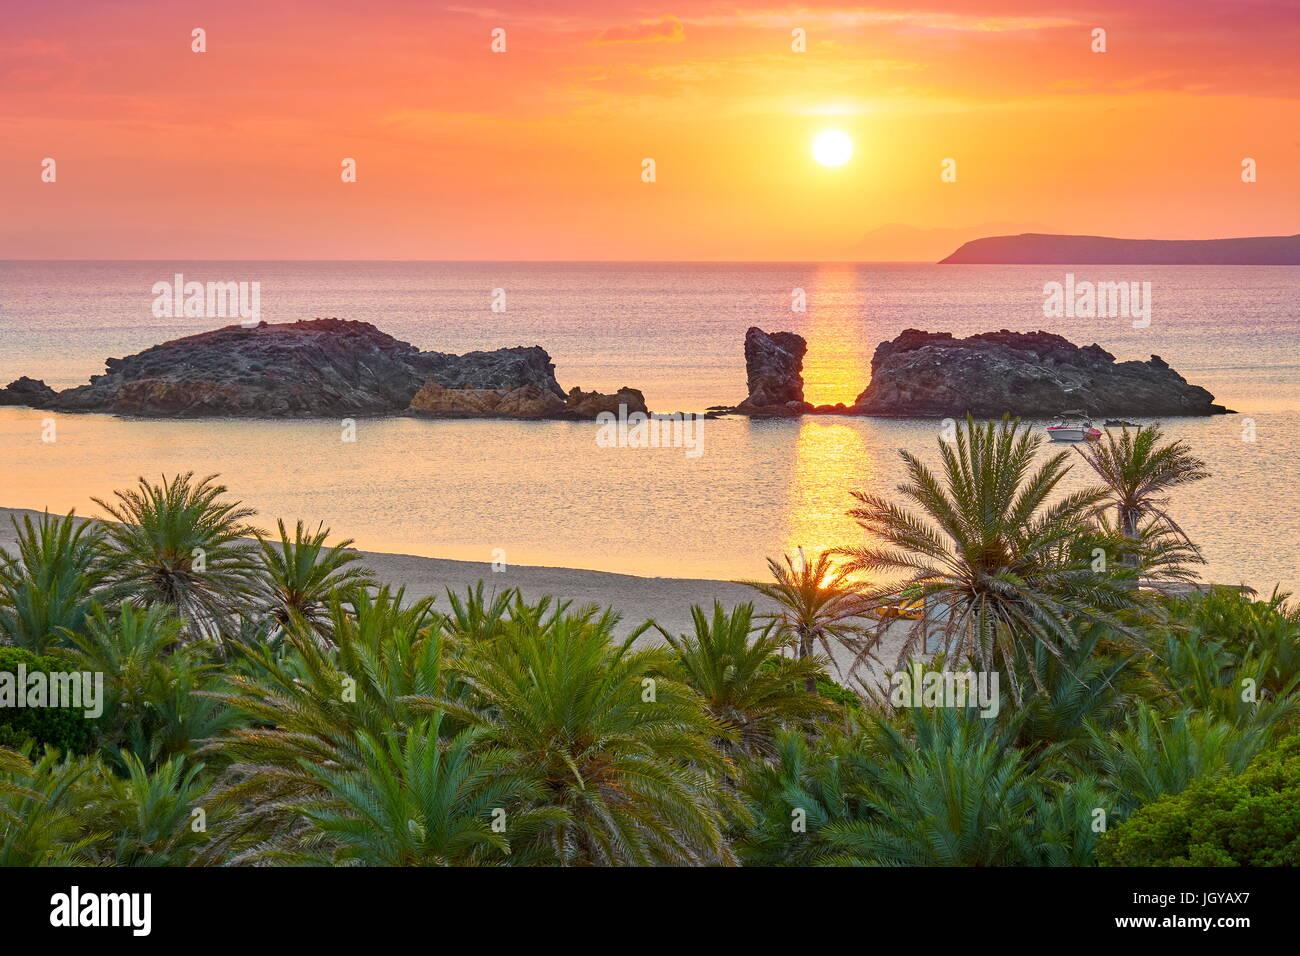 Sunrise at Crete Island - Vai Beach, Greece Stock Photo